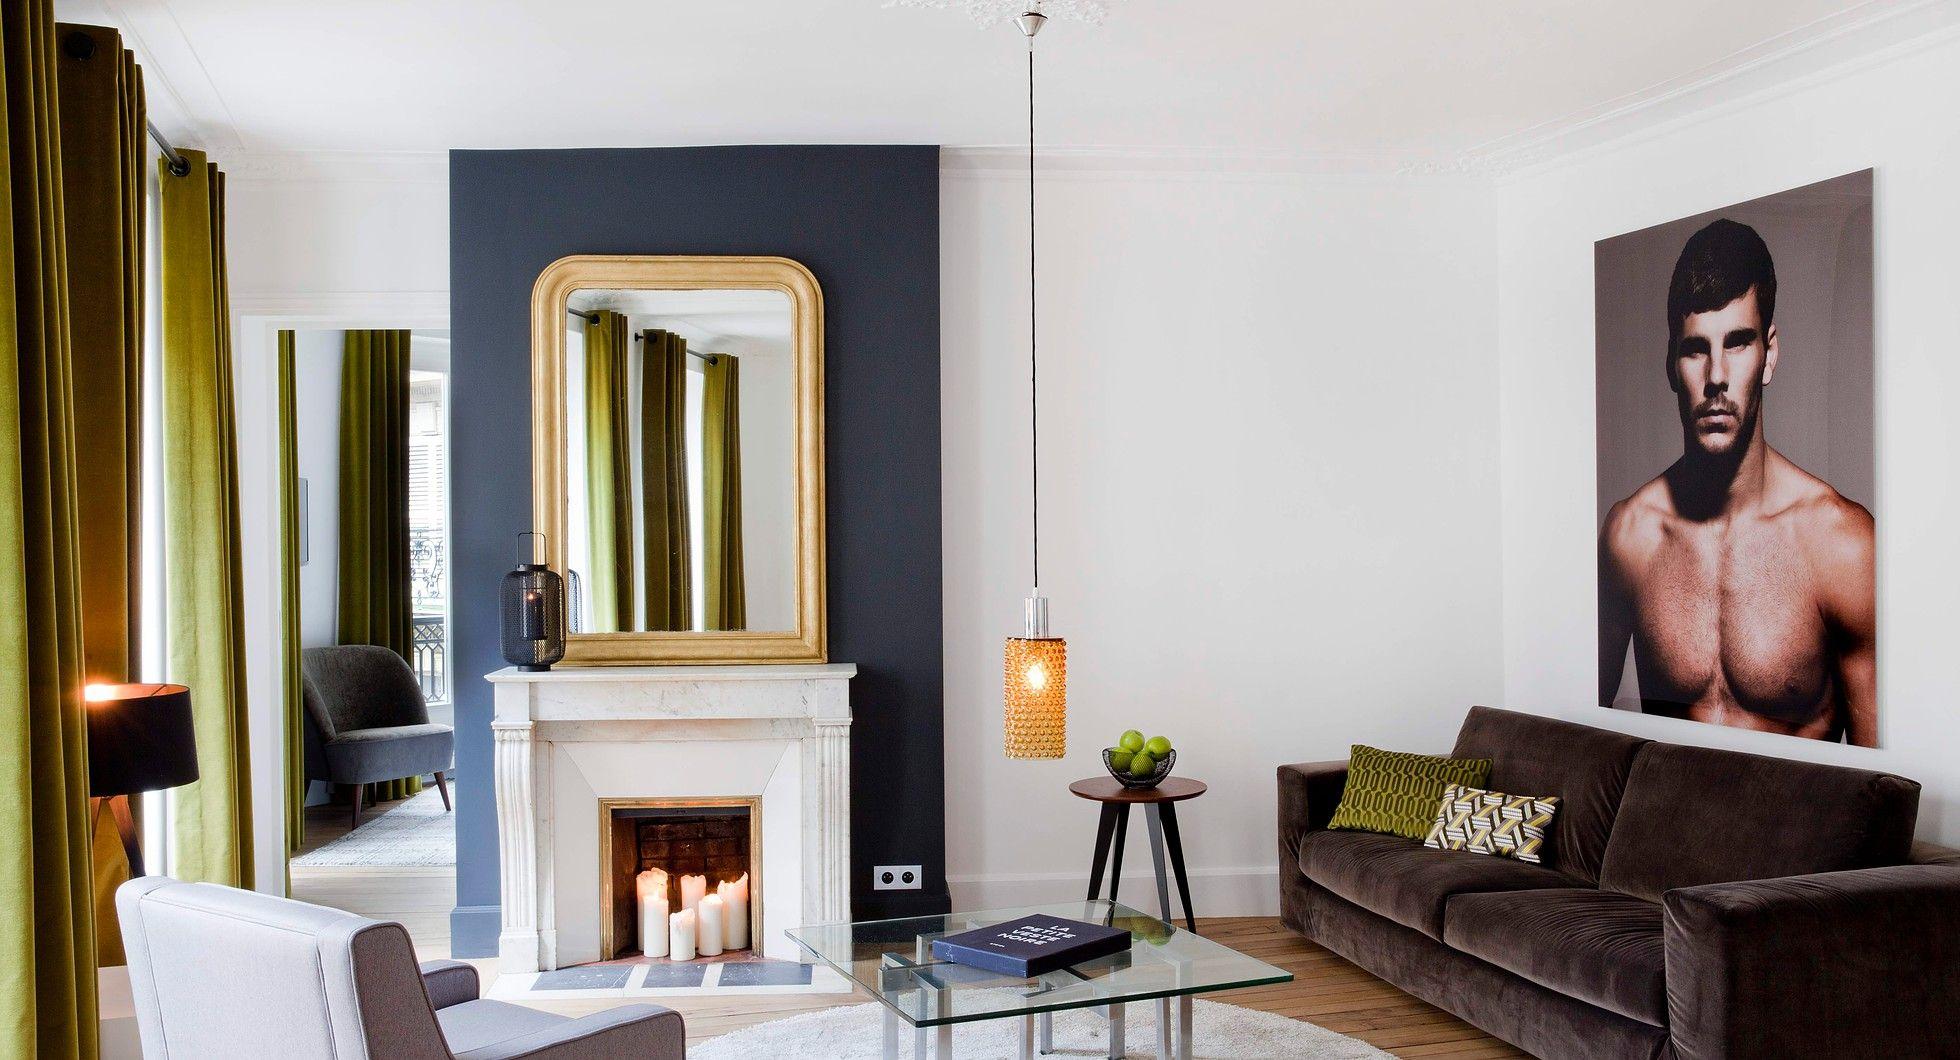 maureen karsenty renovation appartement architecte d 39 int rieur decoration paris. Black Bedroom Furniture Sets. Home Design Ideas